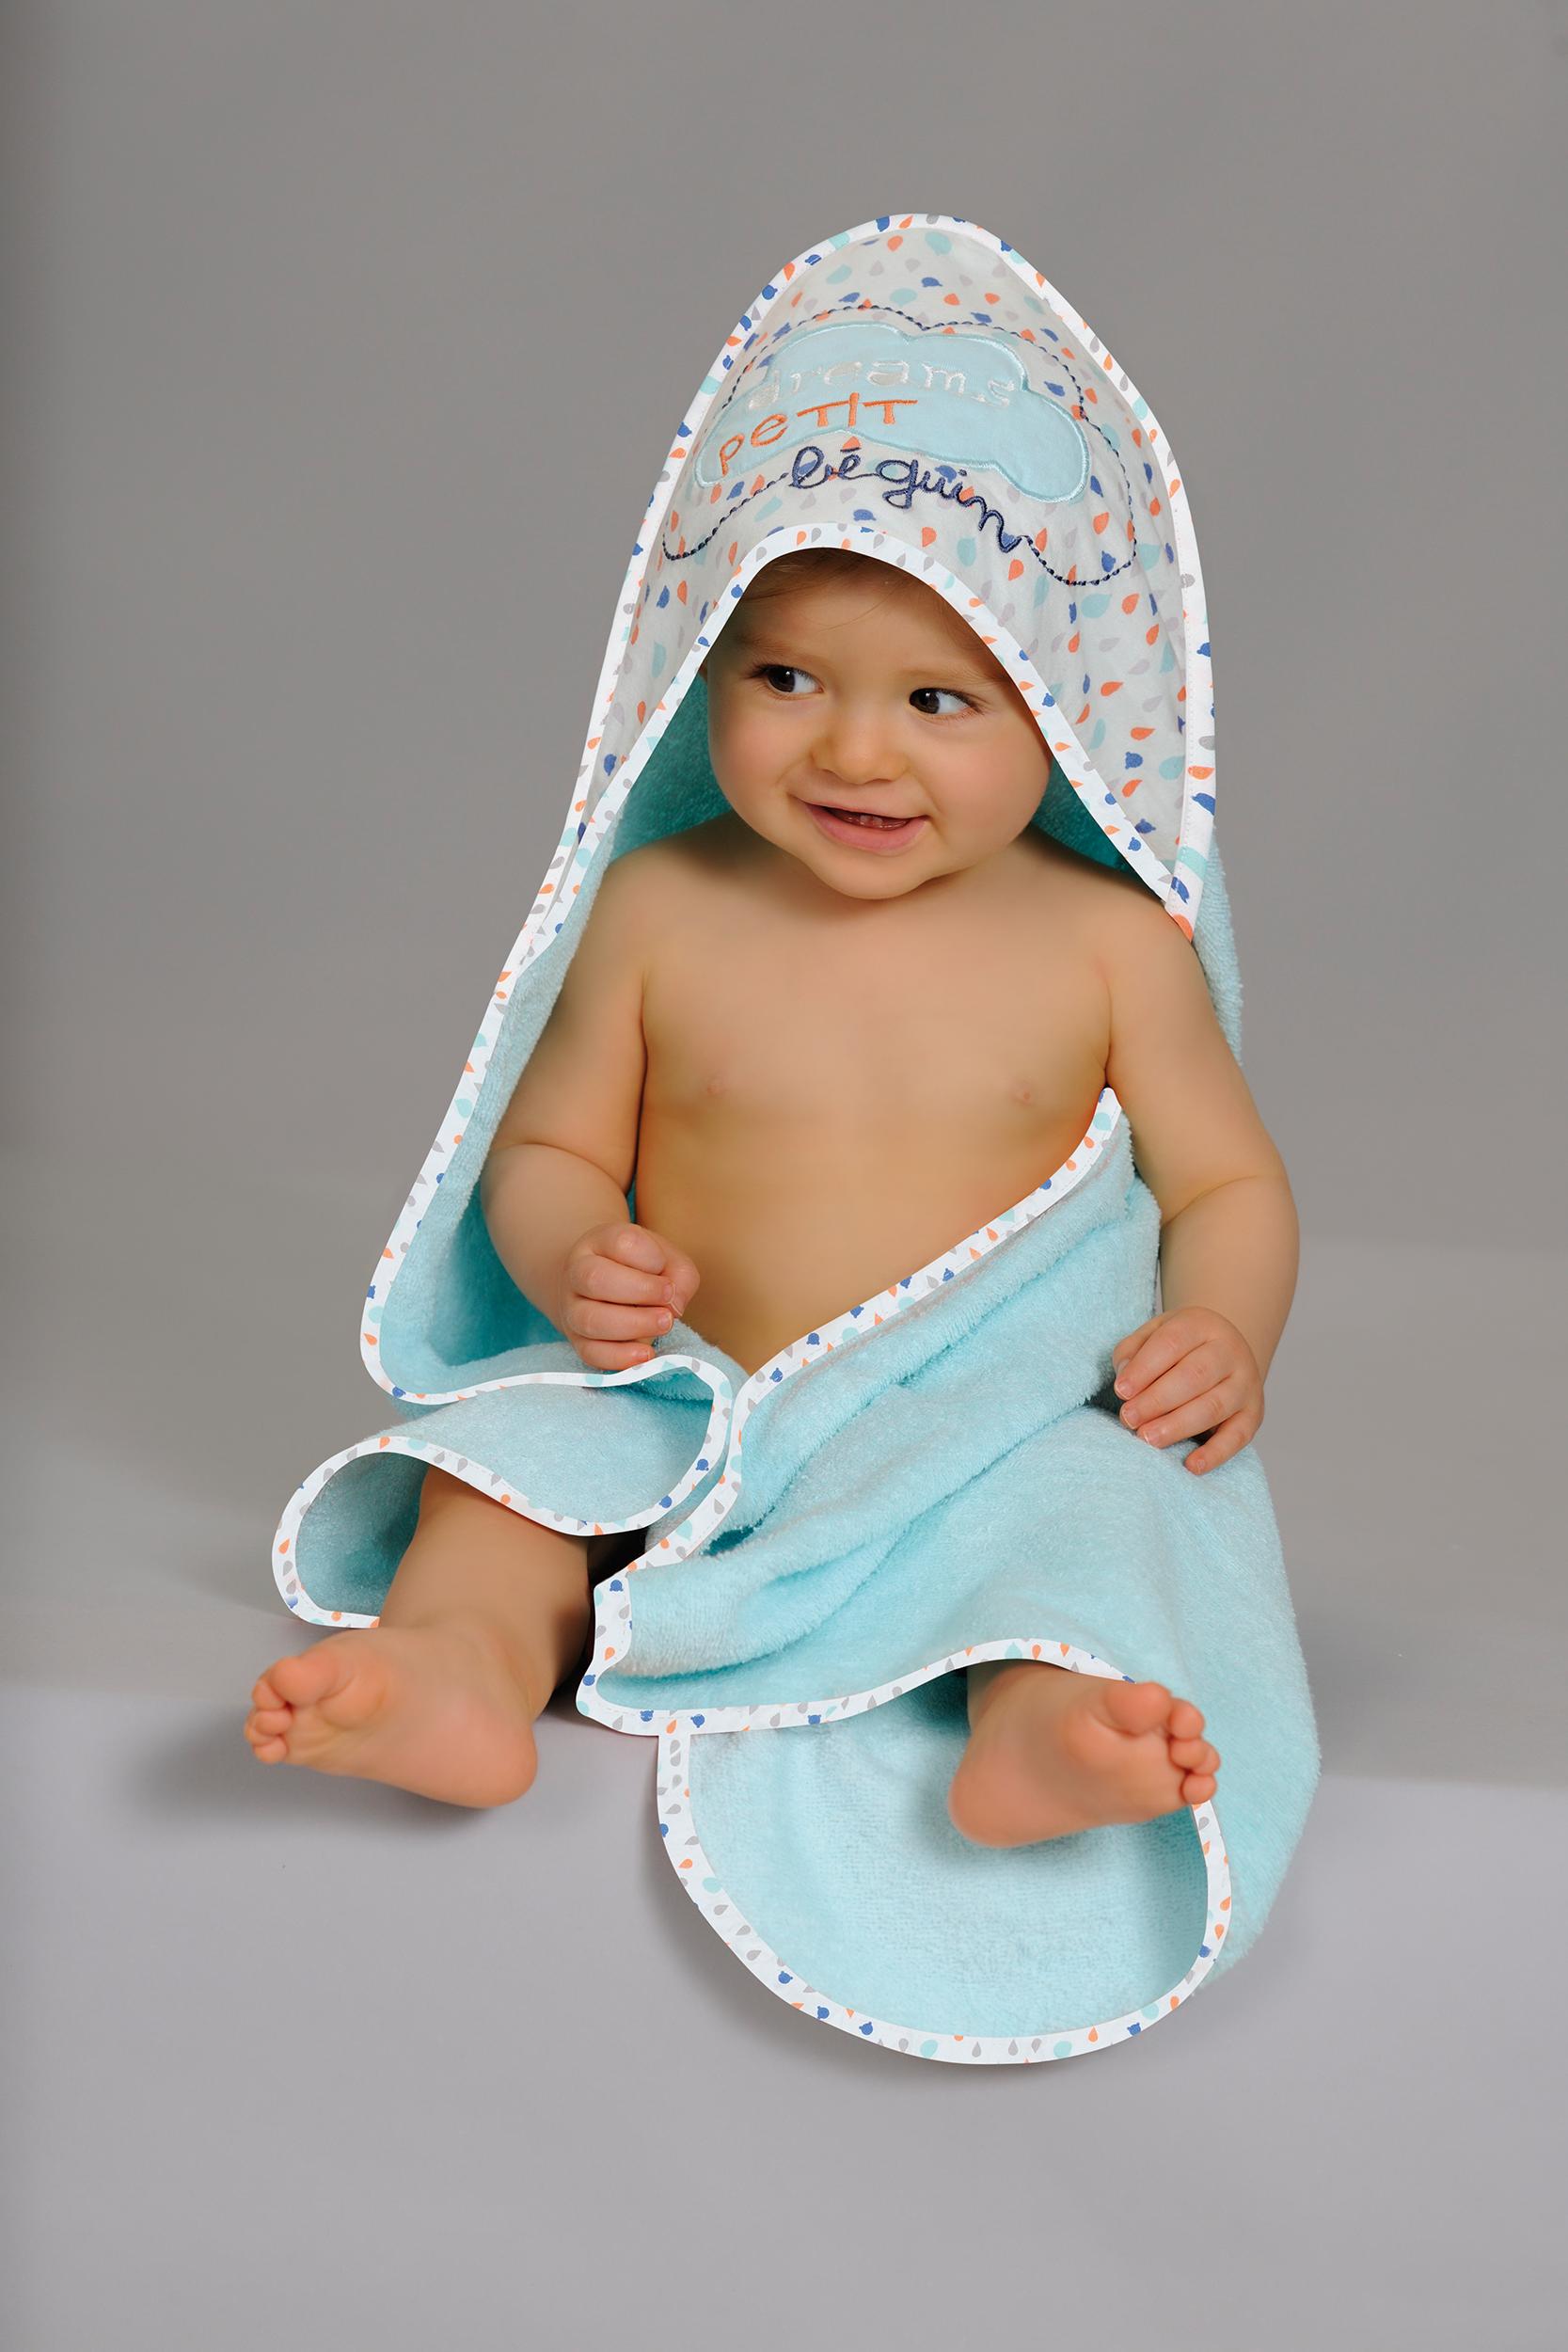 bavoir bebe gar on a croquer petit beguin face maman de ouistiti. Black Bedroom Furniture Sets. Home Design Ideas